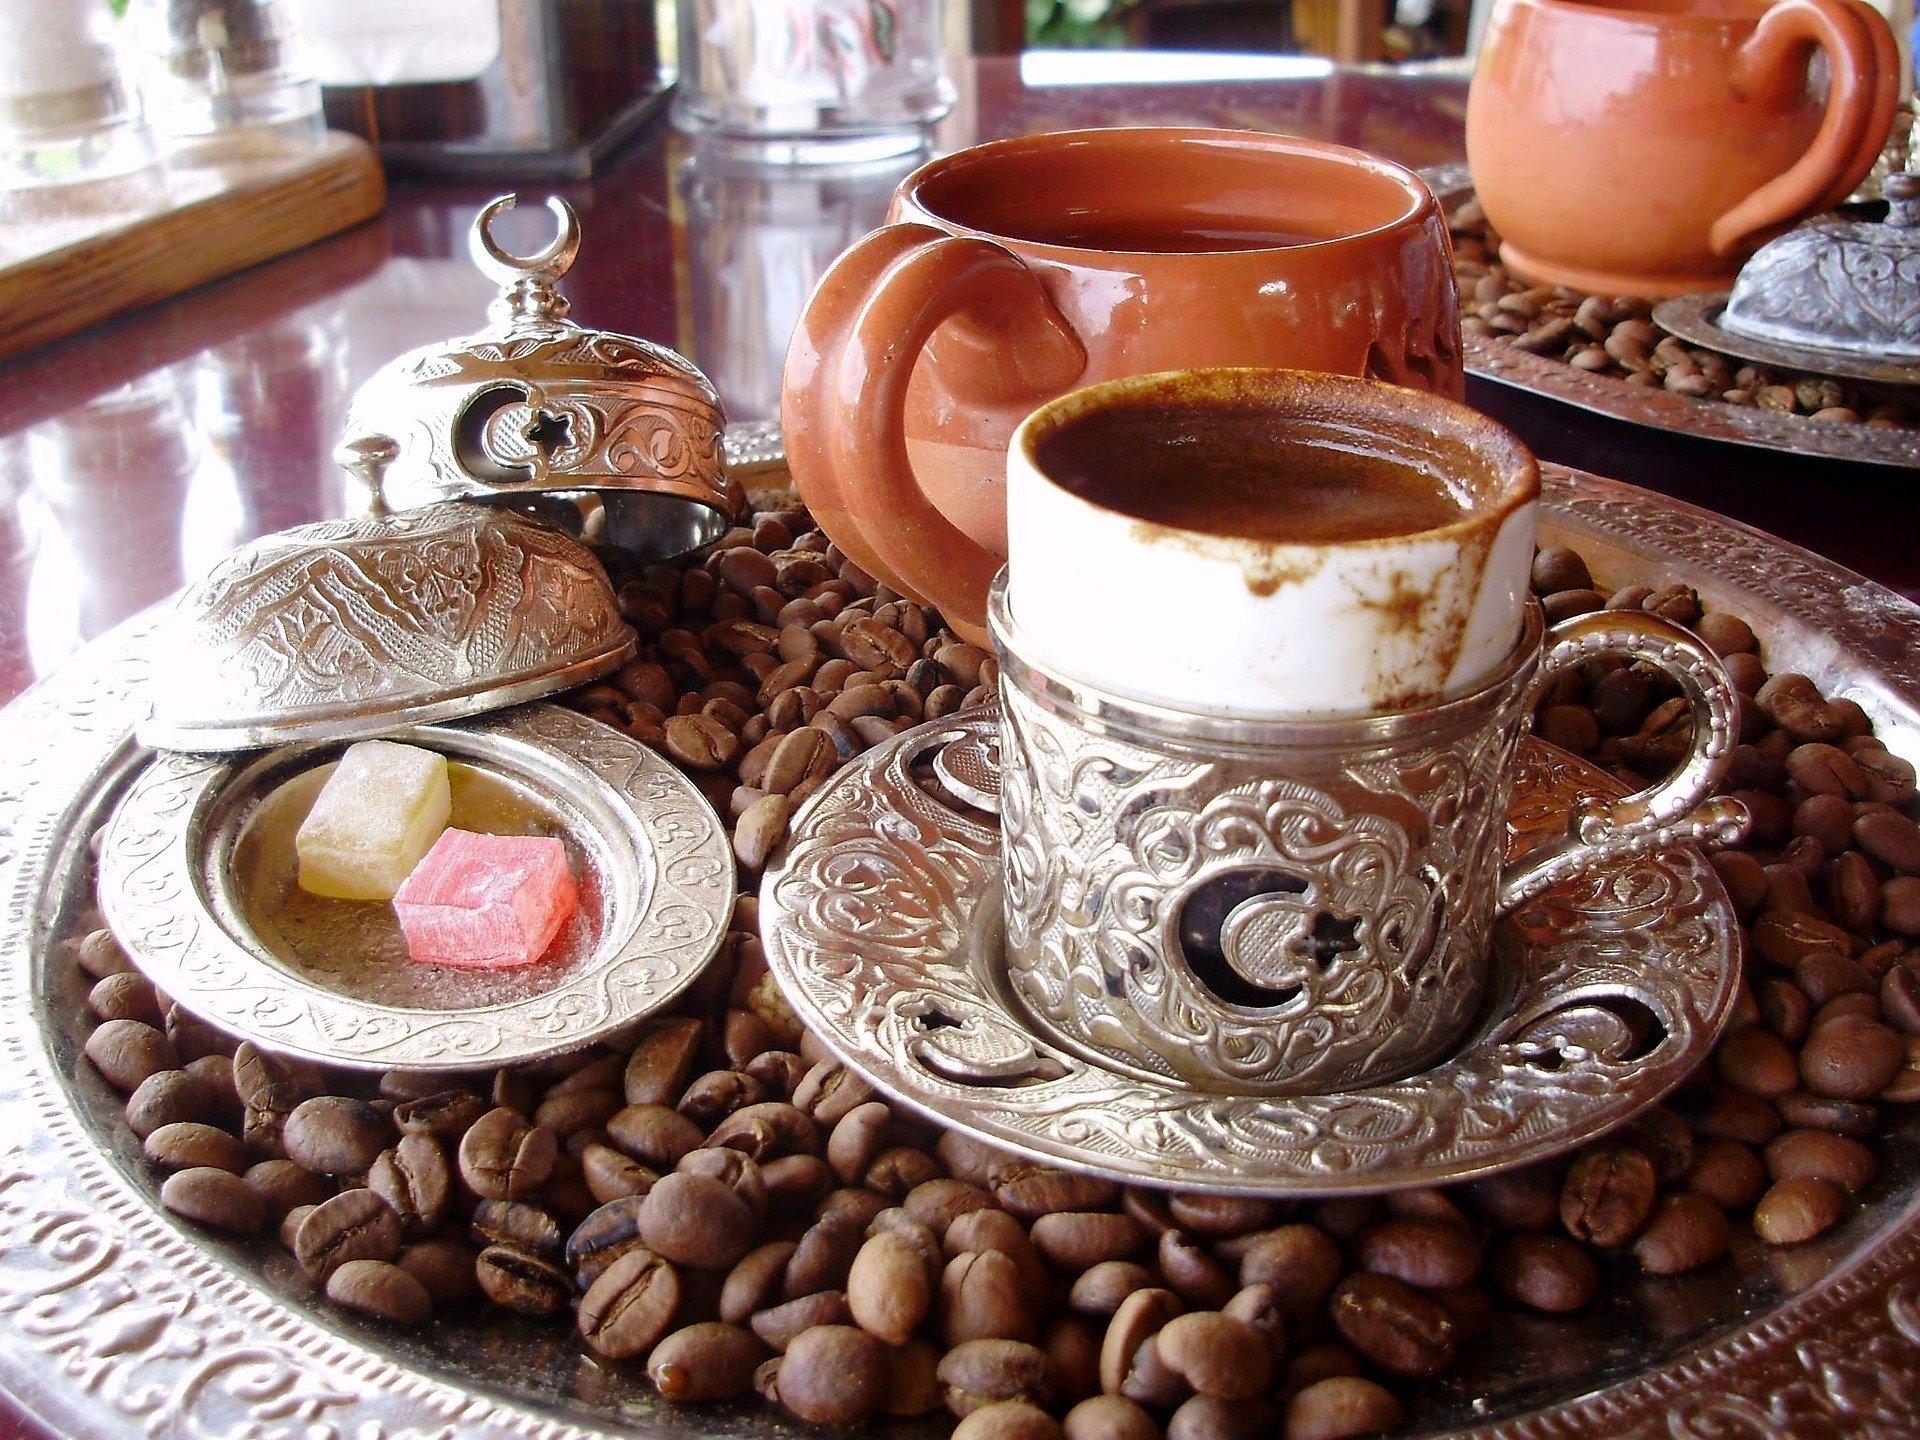 café turco que café toman en Estambul comprar café turco café de Turquía que es el café turco que tipo de café toman los turcos que café toman los turcos café turco propiedades